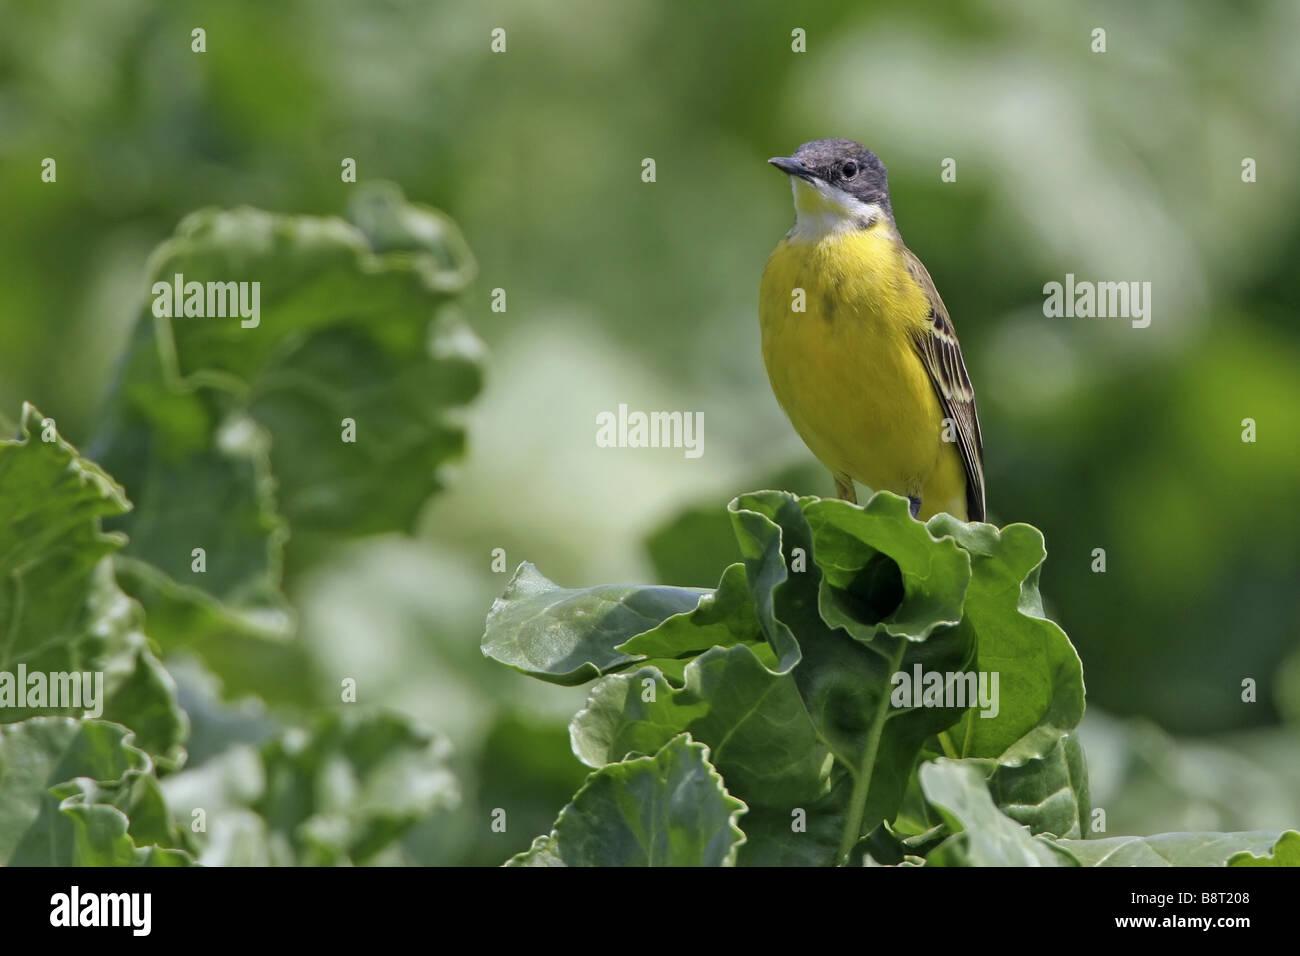 Ashy-headed Wagtail, Yellow wagtail (Motacilla flava cinereocapilla), sitting on cabbage, Italy, Apulia, Pulia - Stock Image